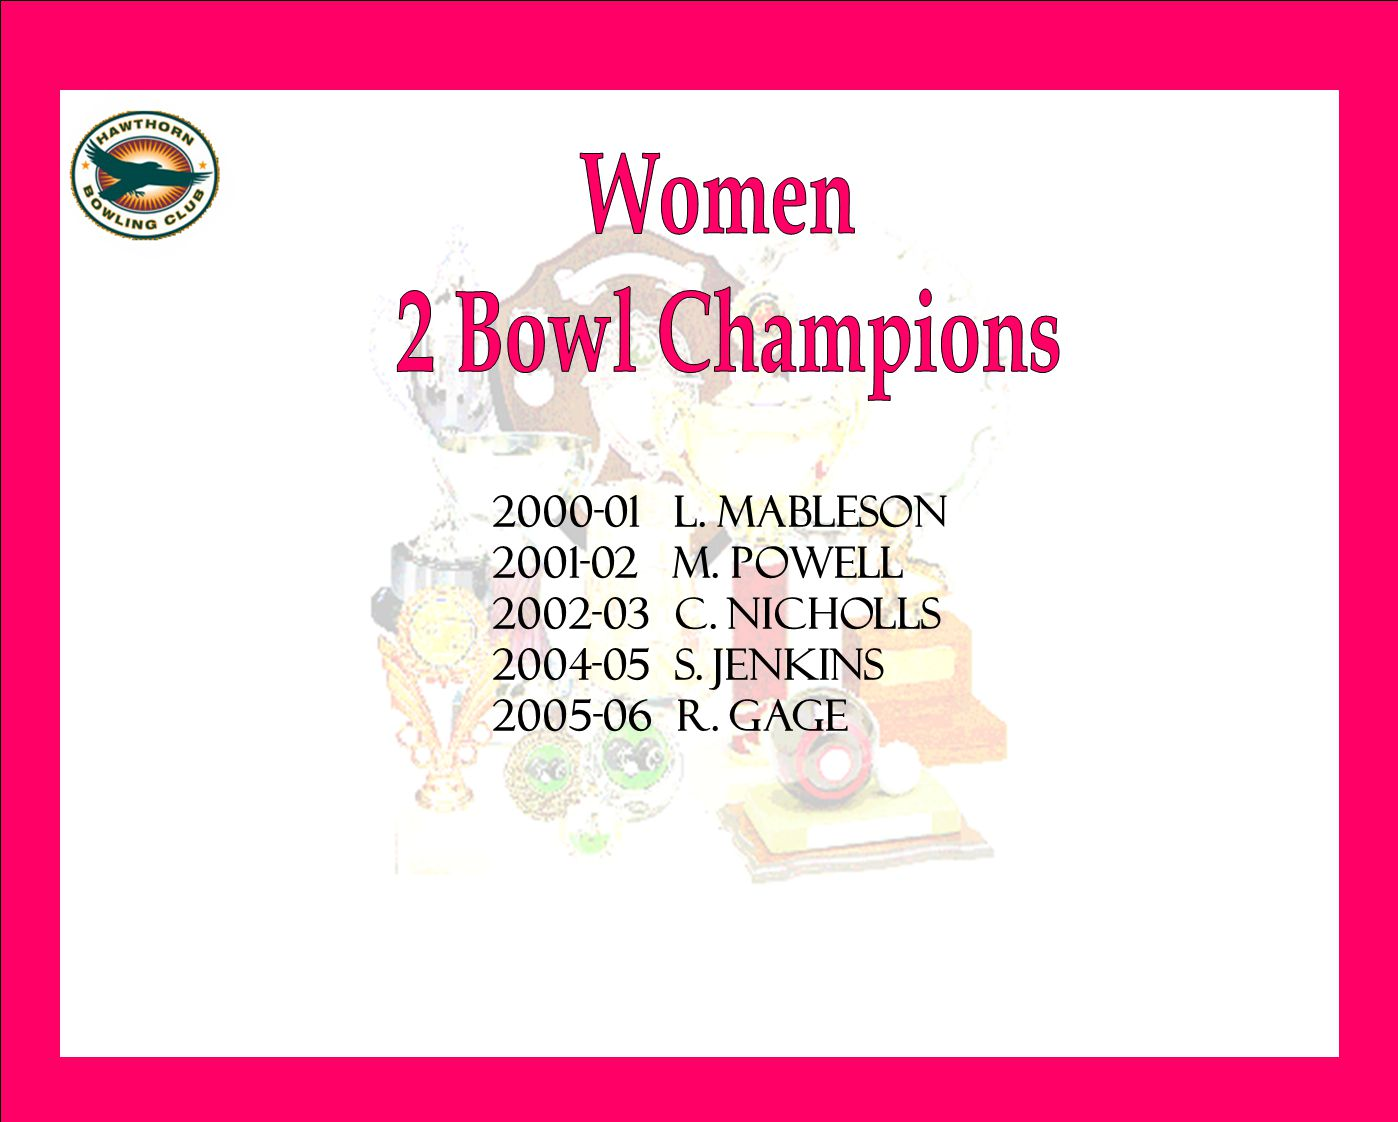 2000-01 l. mableson 2001-02 m. powell 2002-03 c. nicholls 2004-05 s. jenkins 2005-06 r. gage